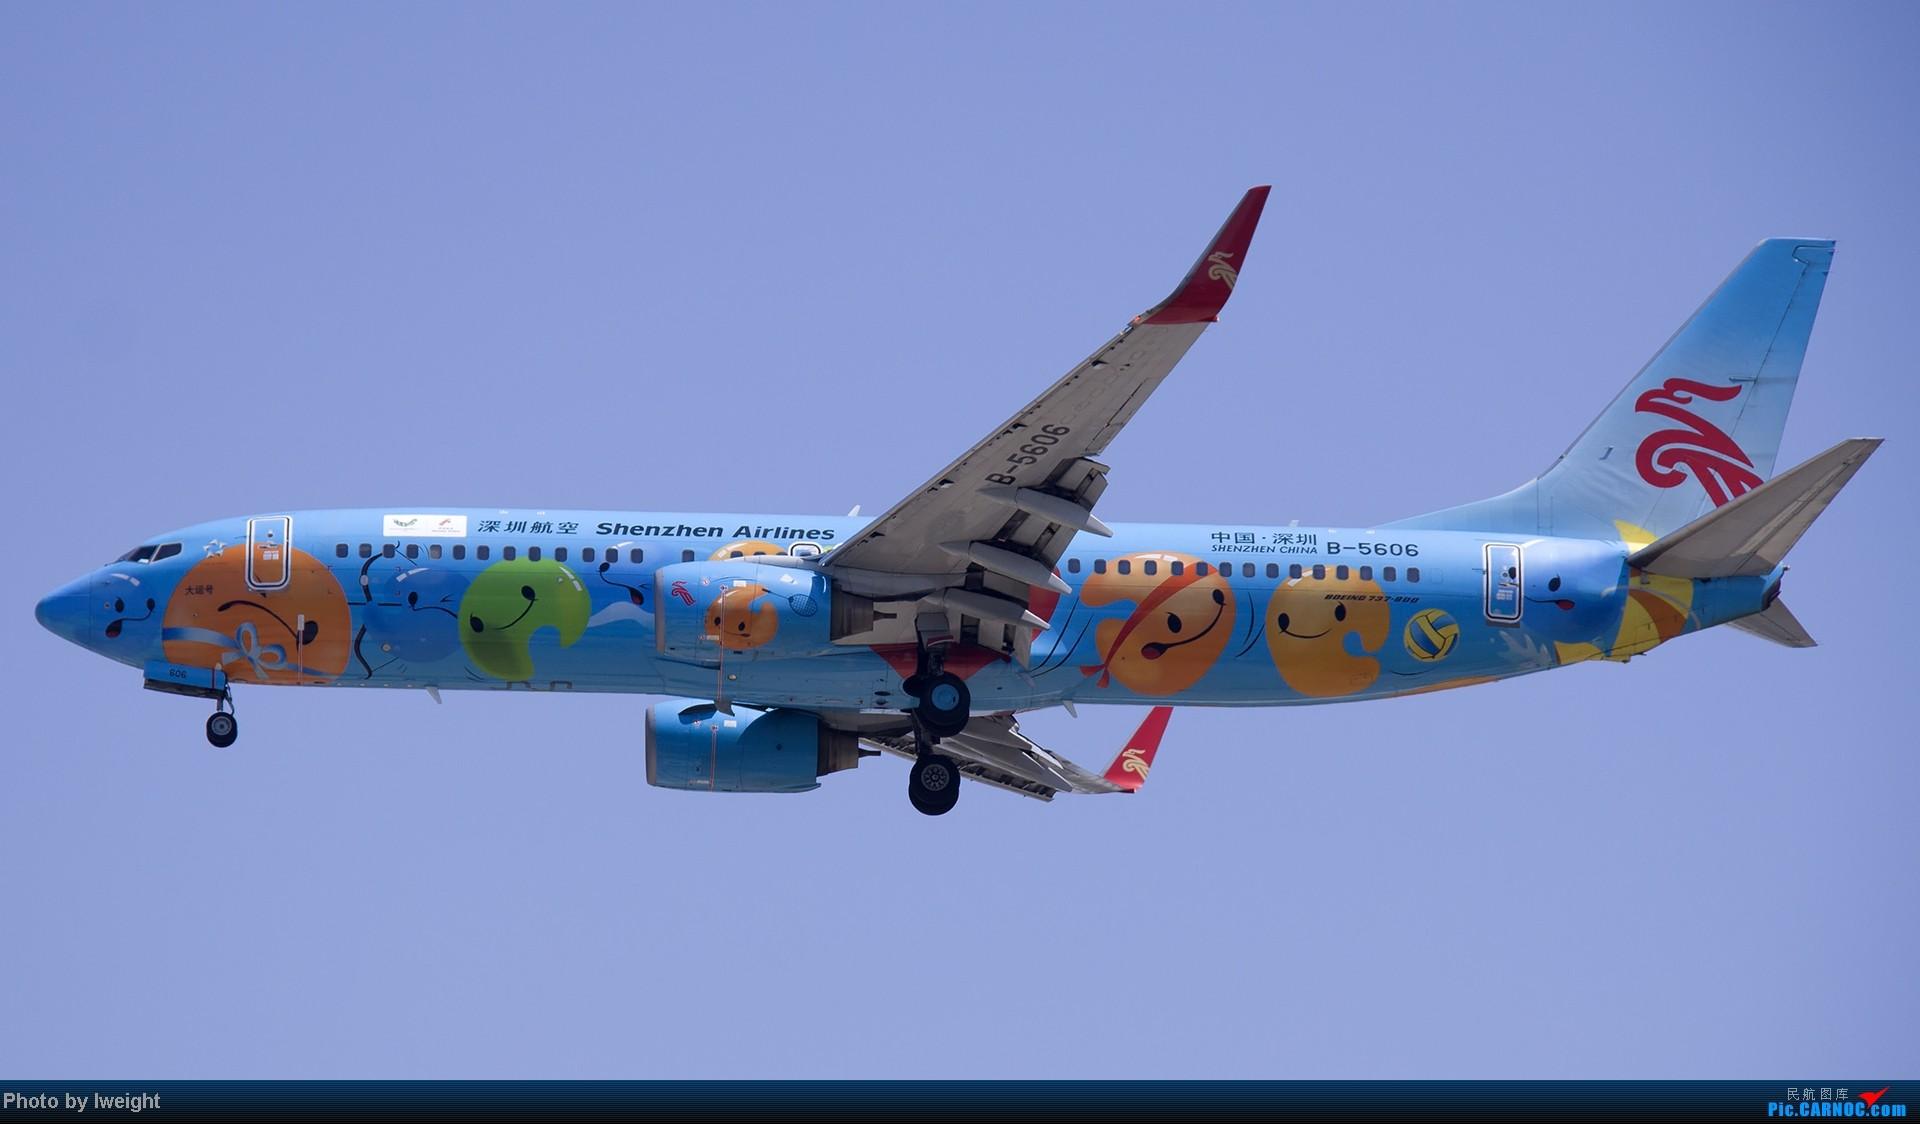 Re:[原创]北京难得的好天气,收获多种机型和彩绘,遗憾的是再次错过卡航巴塞罗那彩绘 BOEING 737-800 B-5606 中国北京首都机场